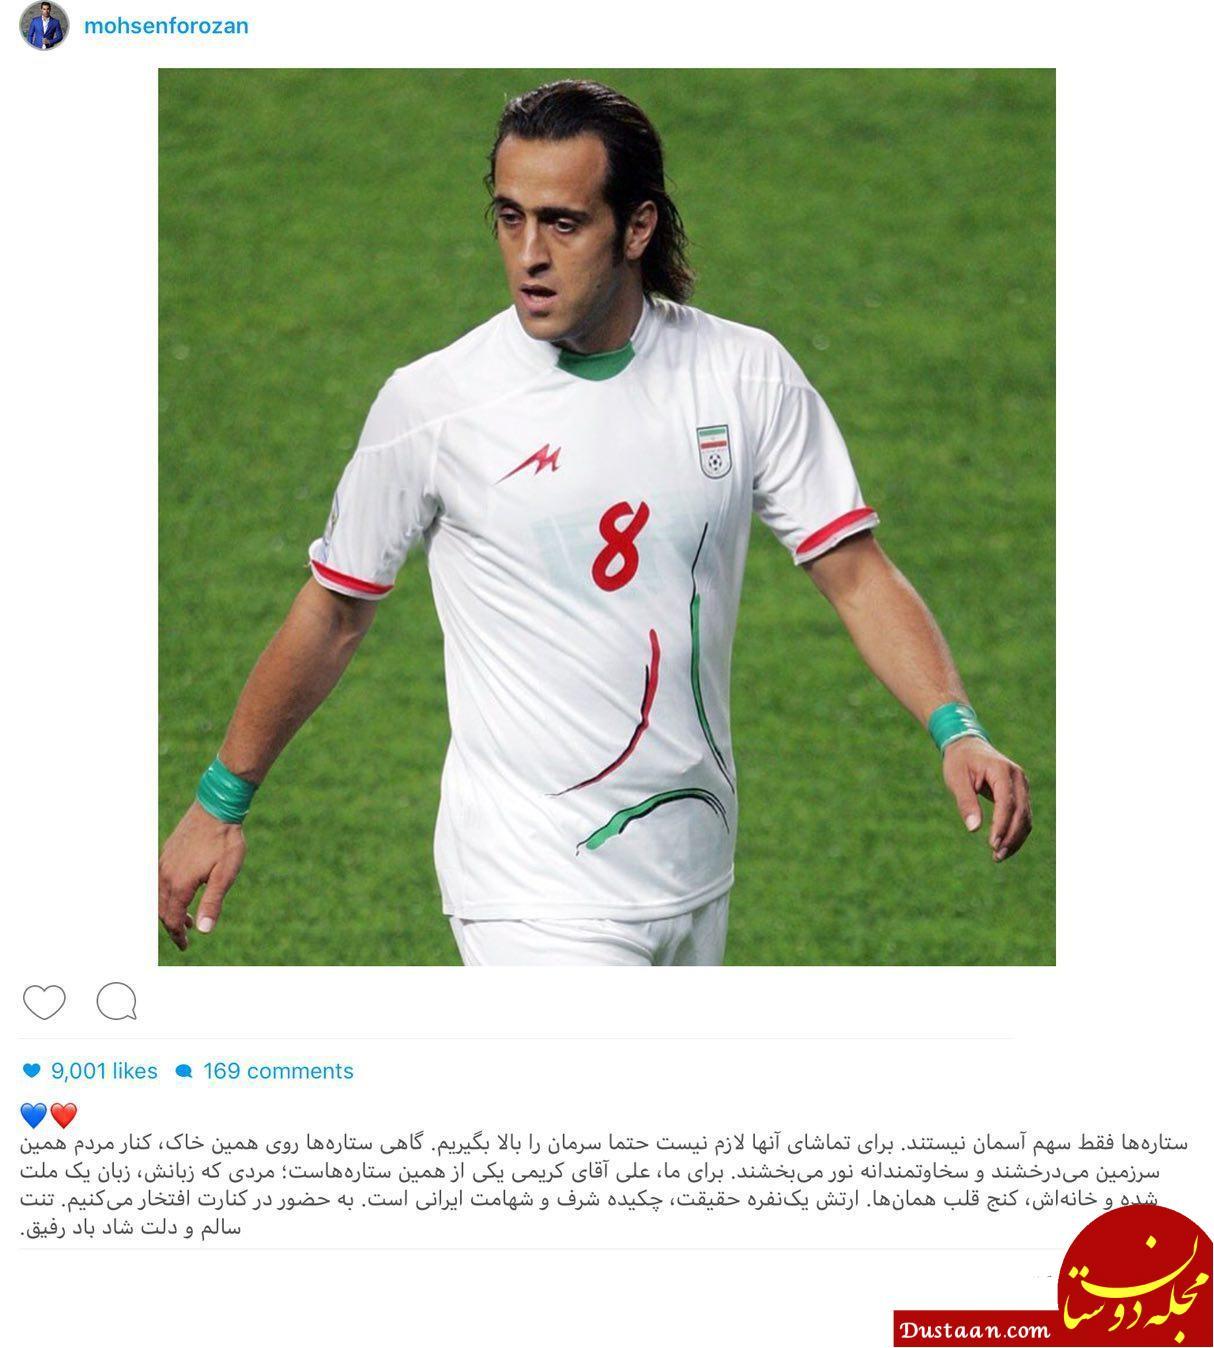 www.dustaan.com حمایت دروازه بان سابق استقلال از على کریمى +عکس